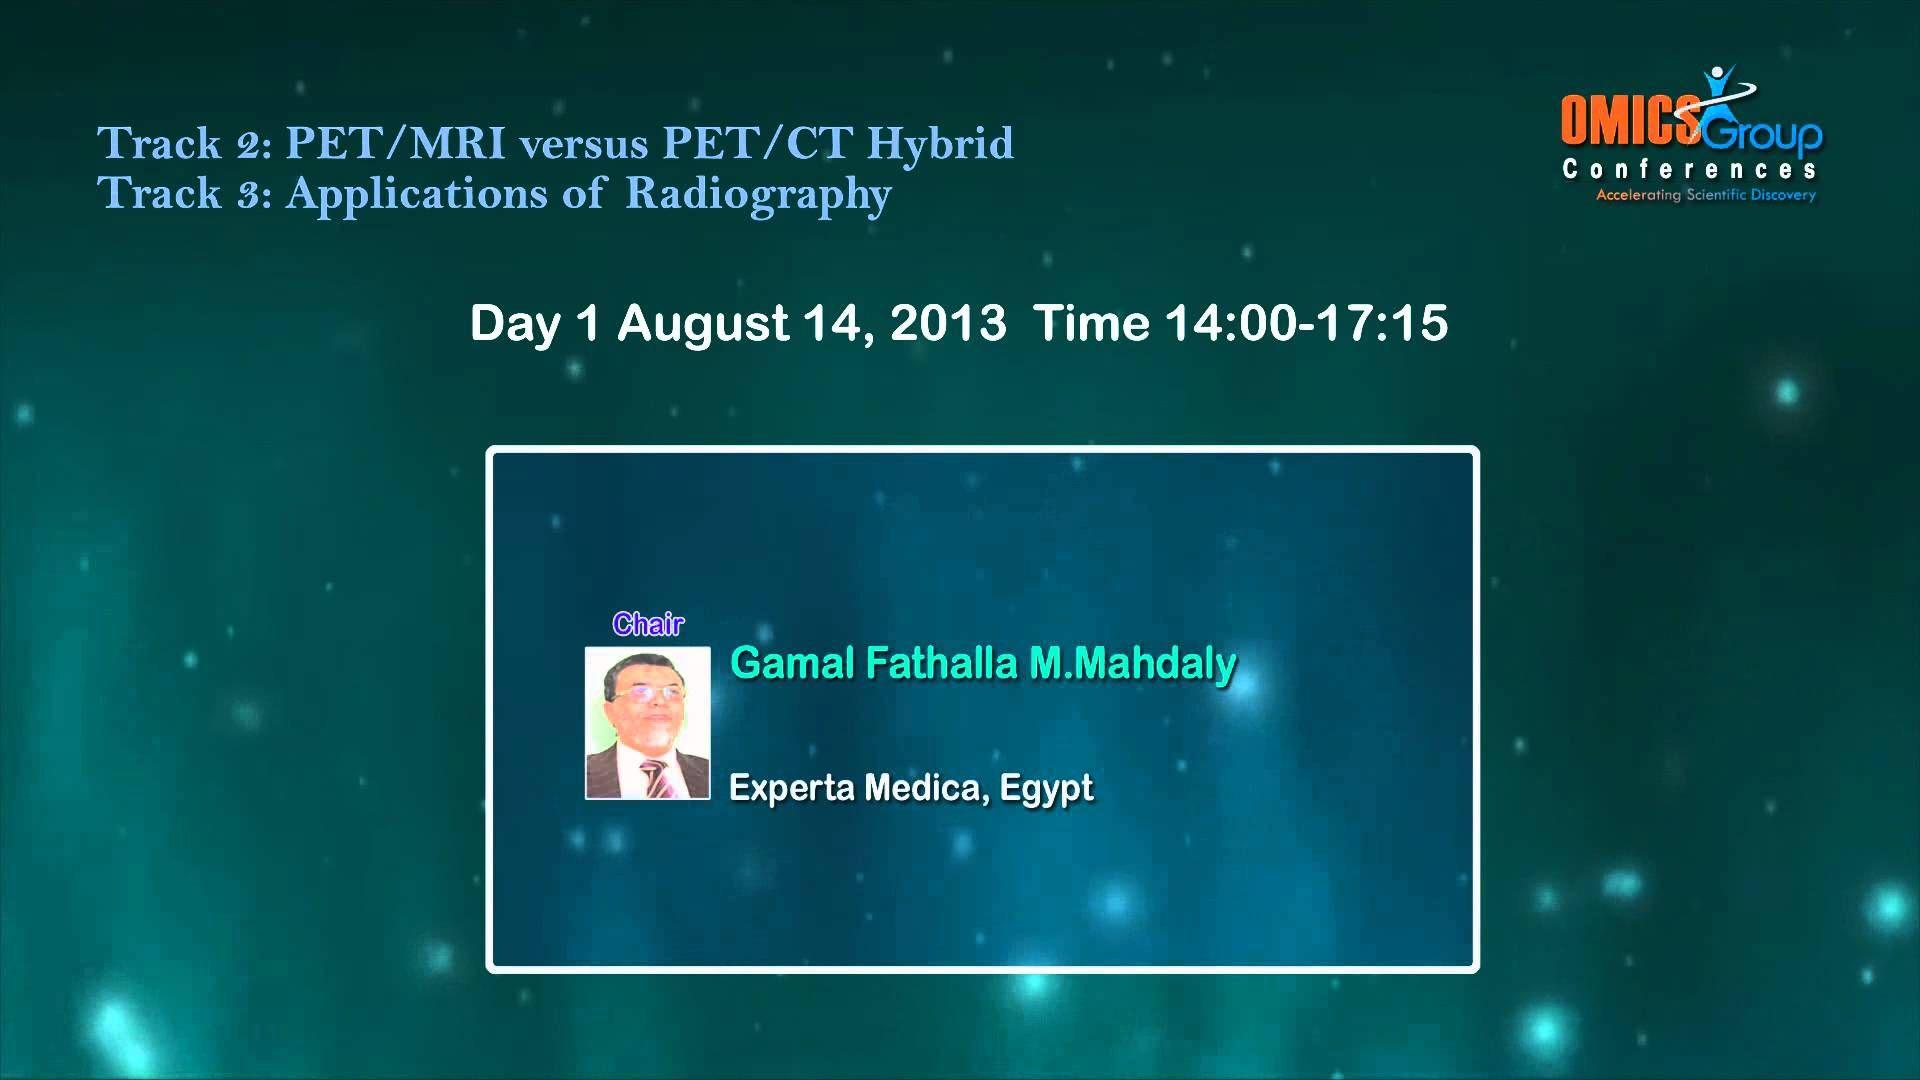 International conference on radiology imaging